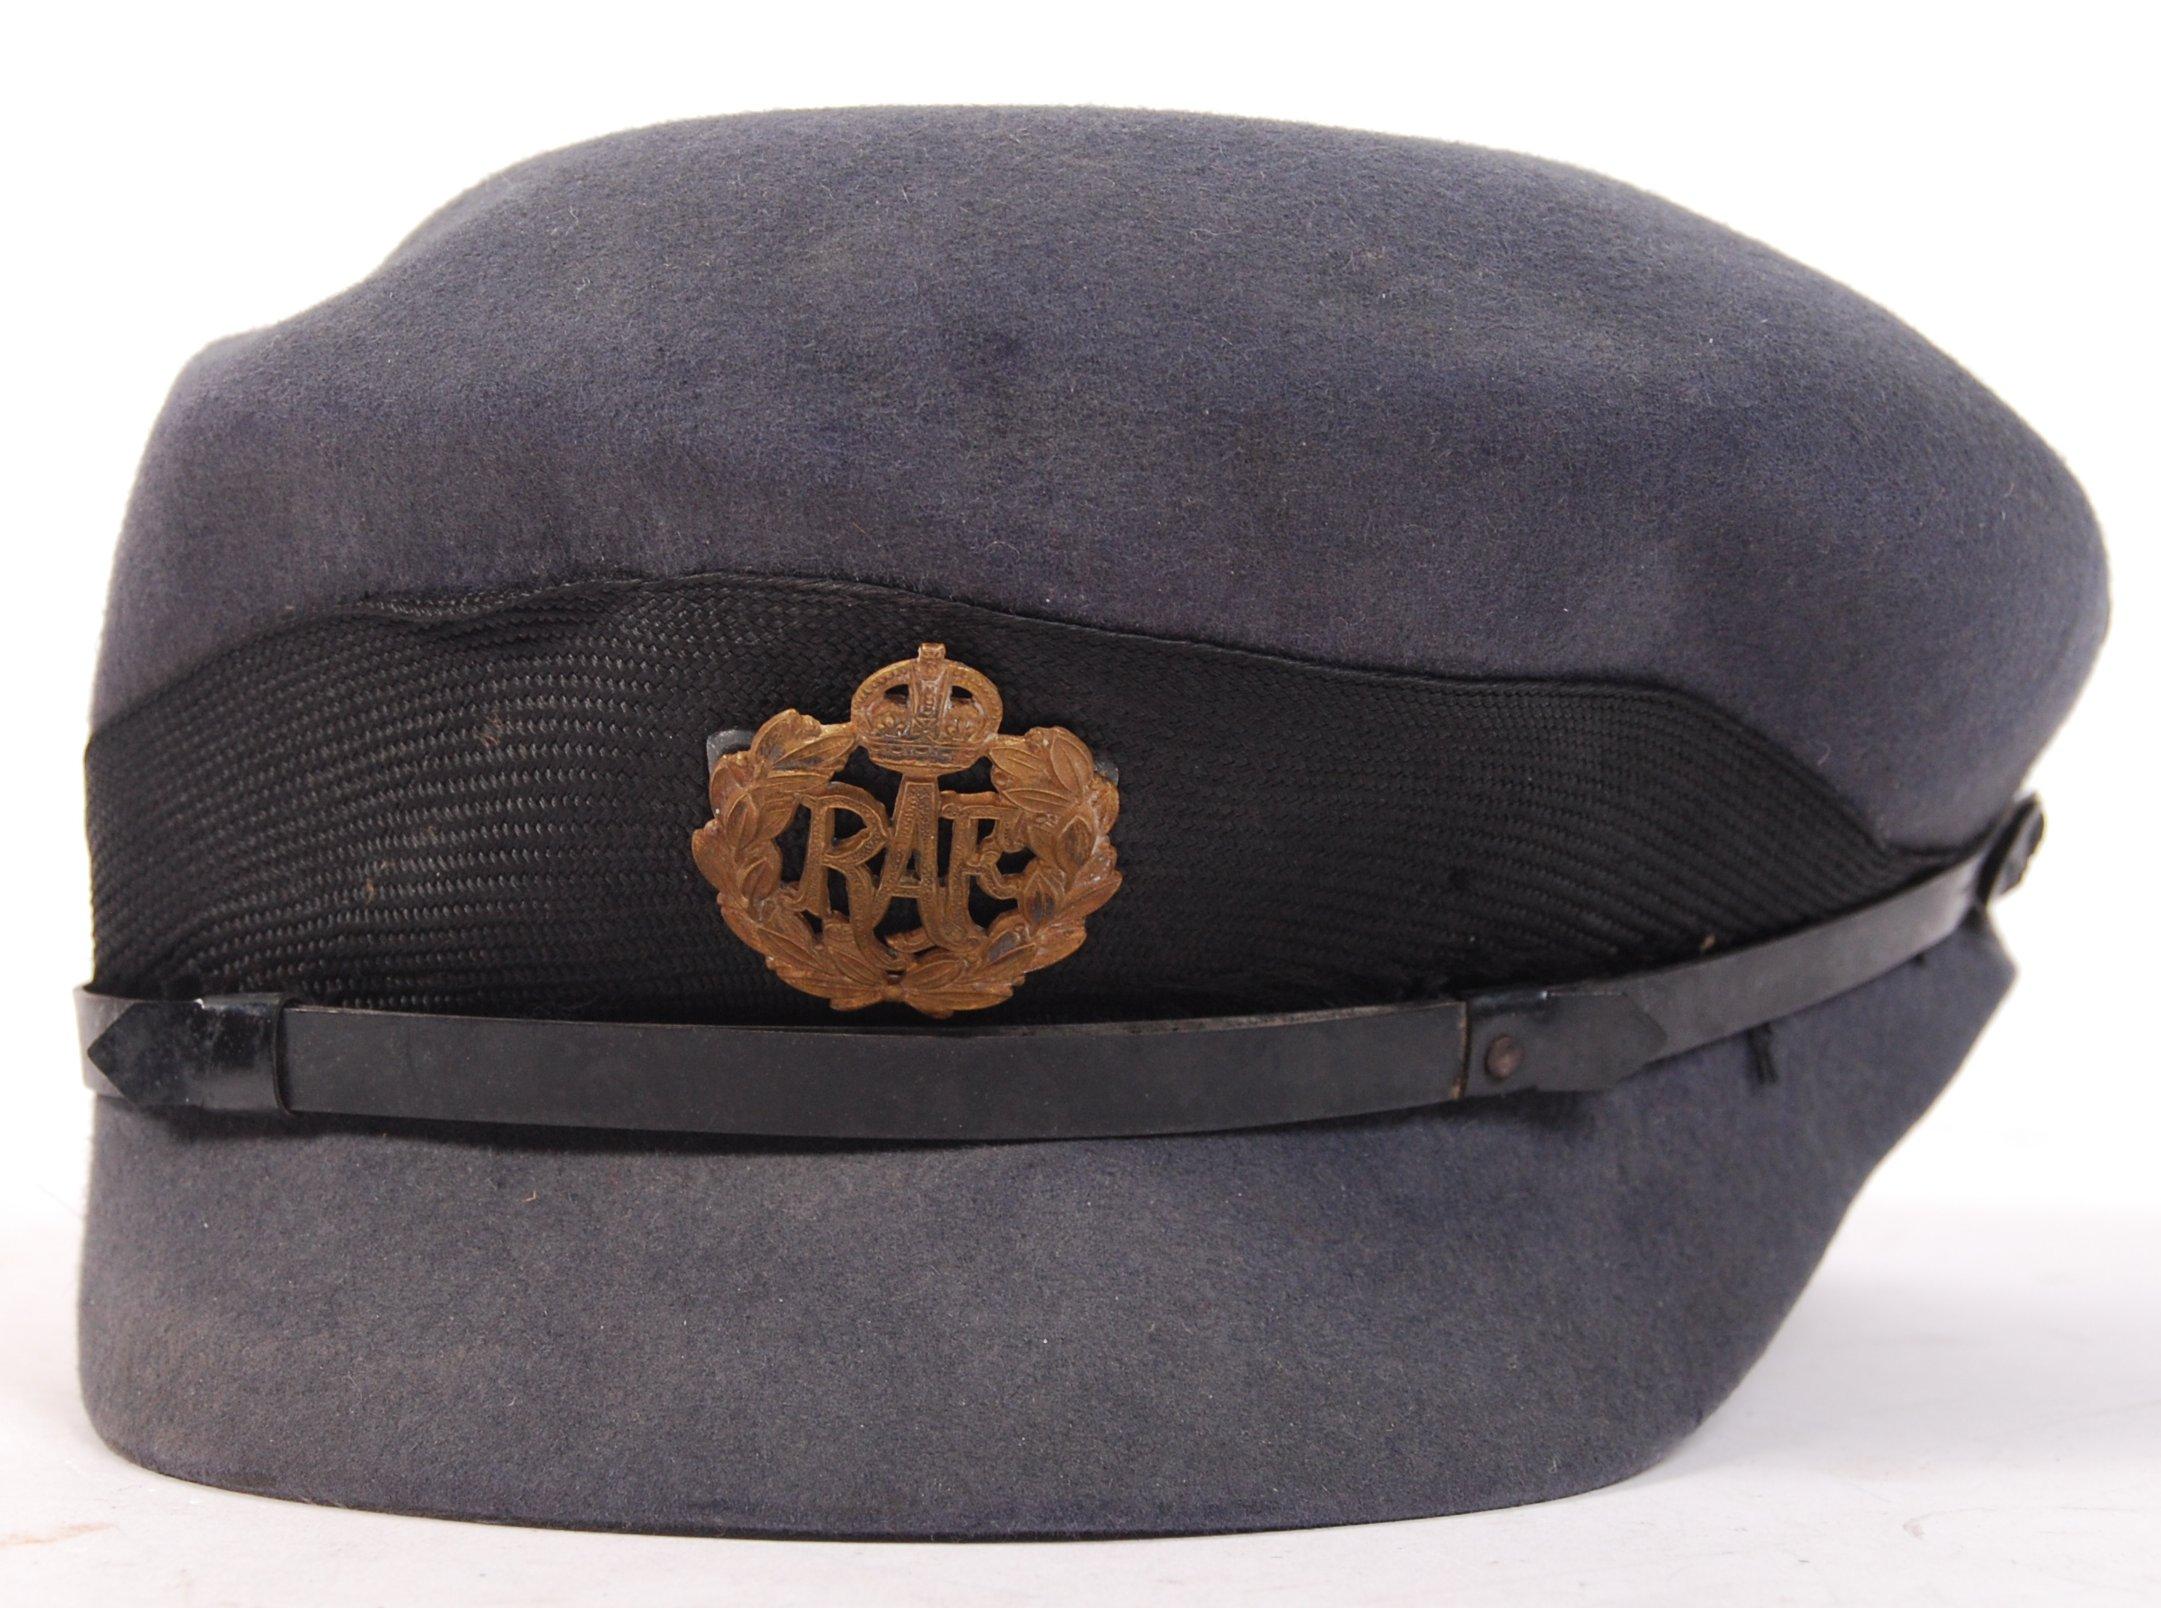 Lot 39 - POST-WWII SECOND WORLD WAR RARE WRAF SERVICE CAP